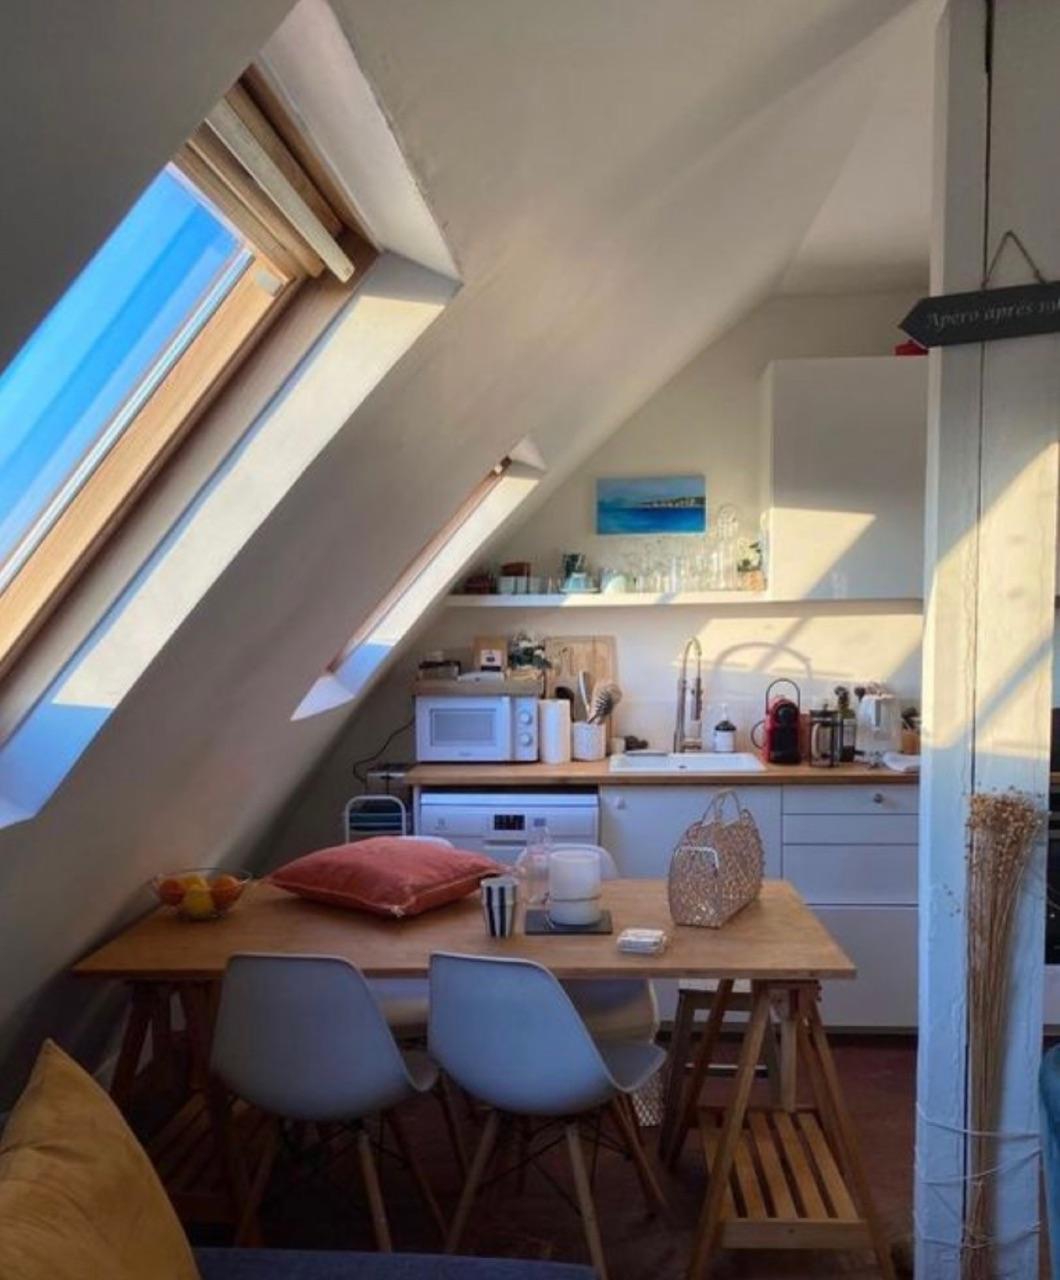 details, furniture, and goals image